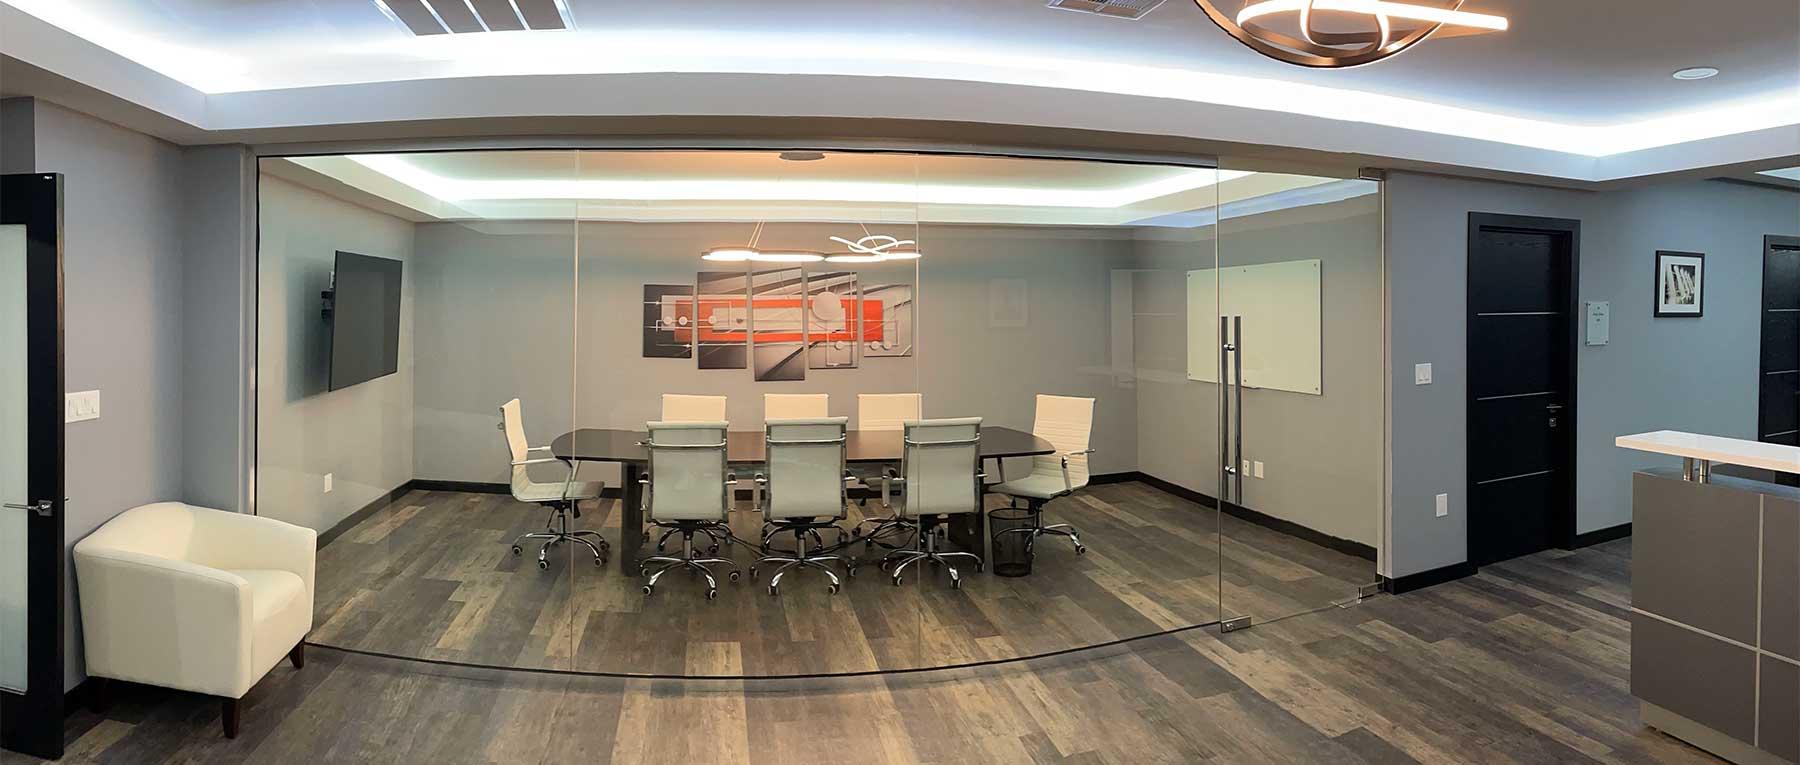 Valex Enterprises Conference Room